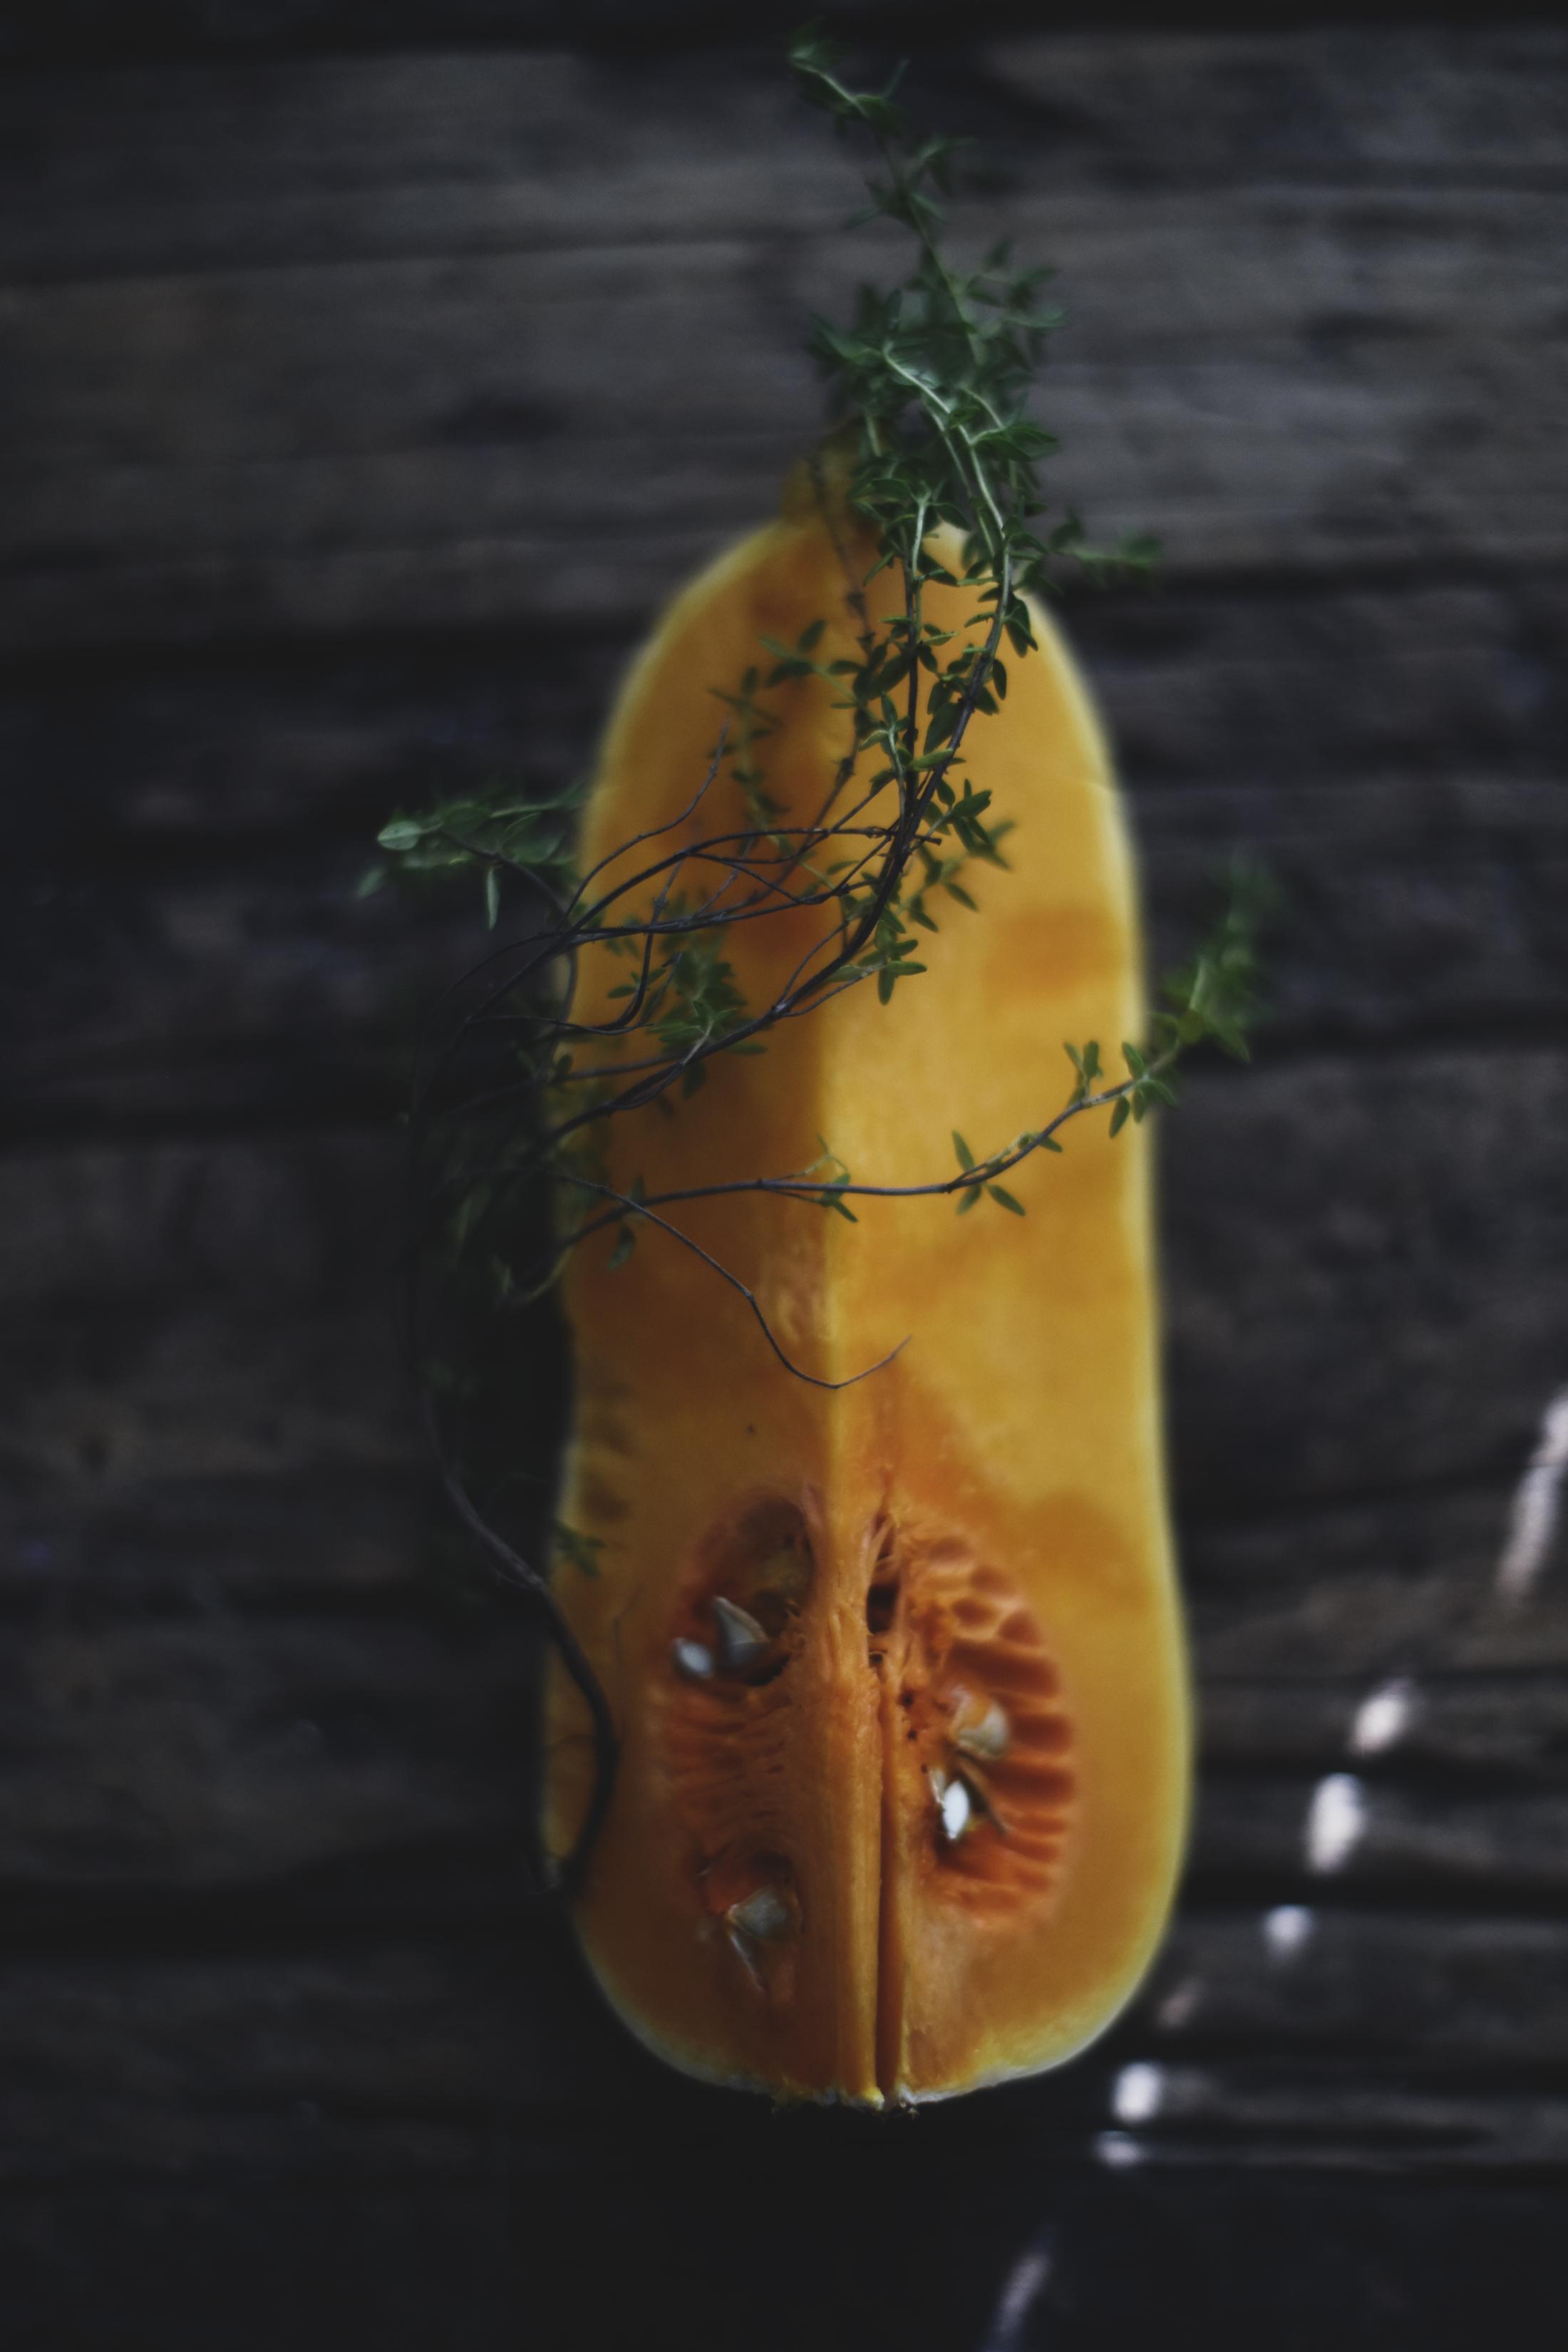 xButternutSquash_Dinnertimestories_003